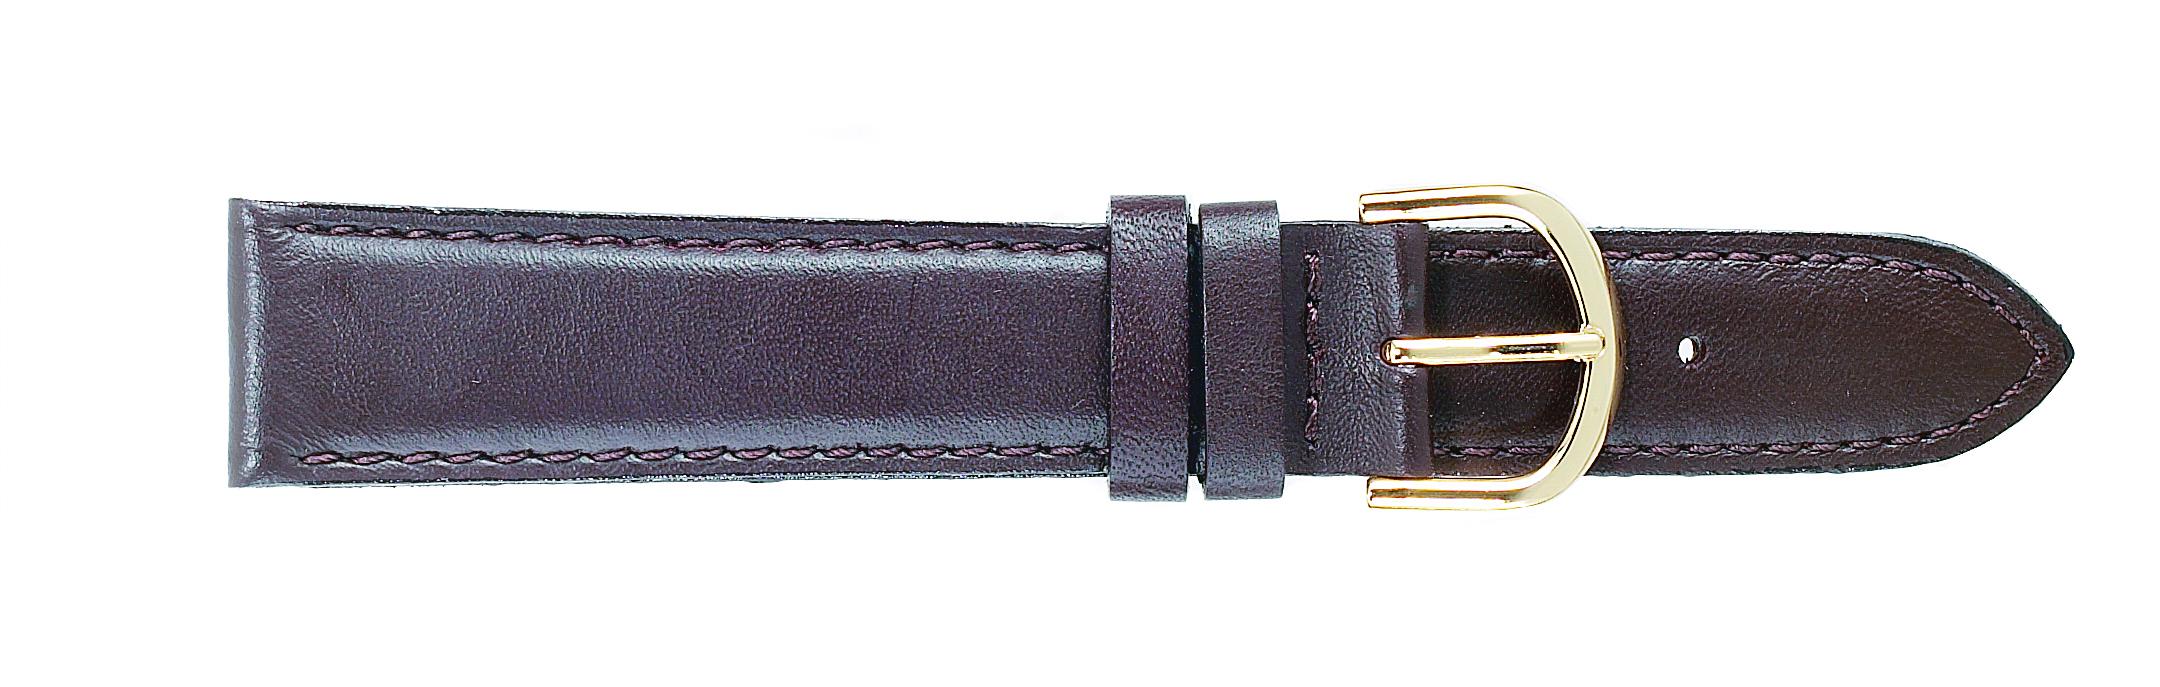 20mm Padded Calf Brown Strap-0